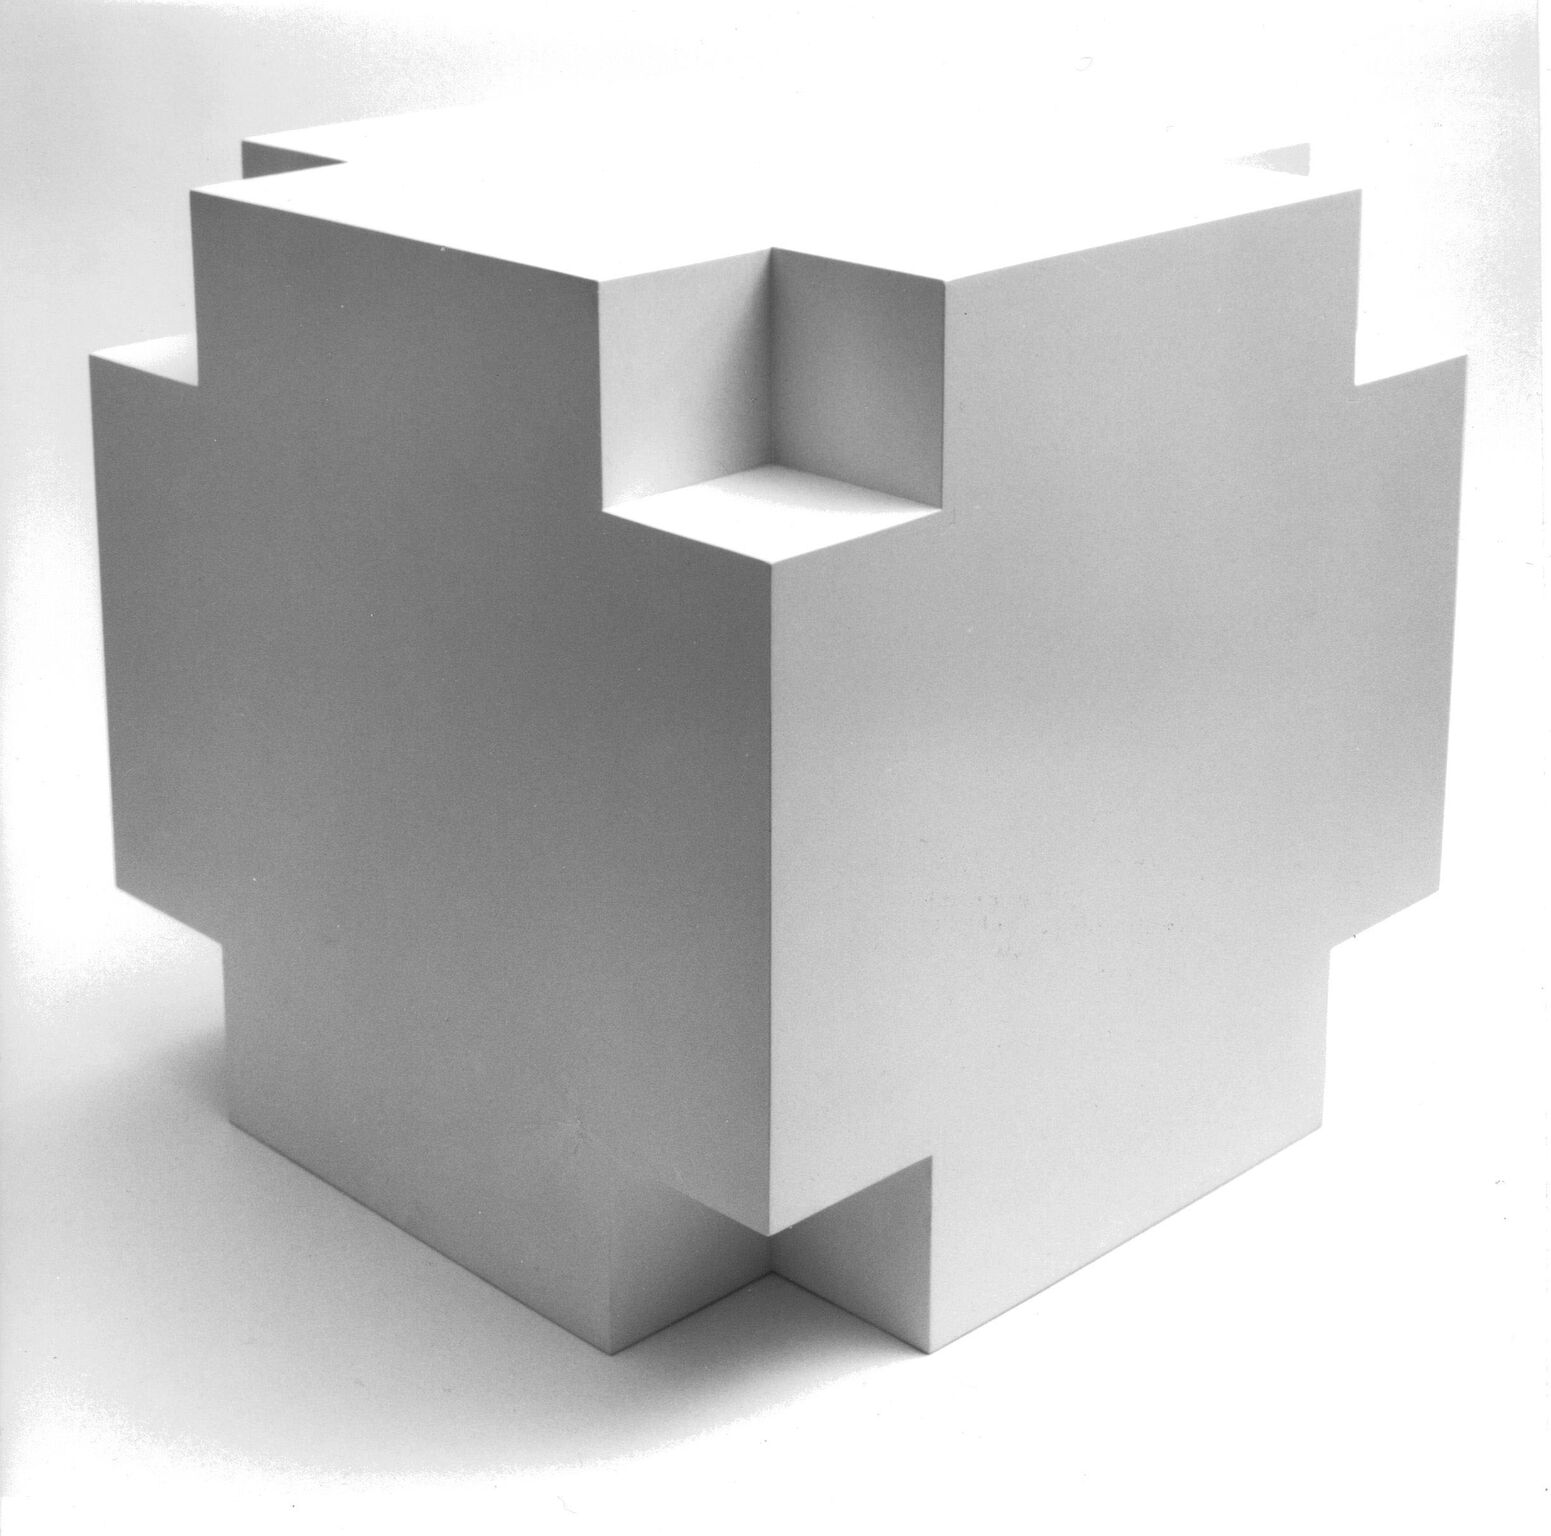 Ewerdt Hilgemann  Cube Structure 134 #720134 , 1972 wood, painted white 23 5/8 x 23 5/8 x 23 5/8 in (60 x 60 x 60 cm)